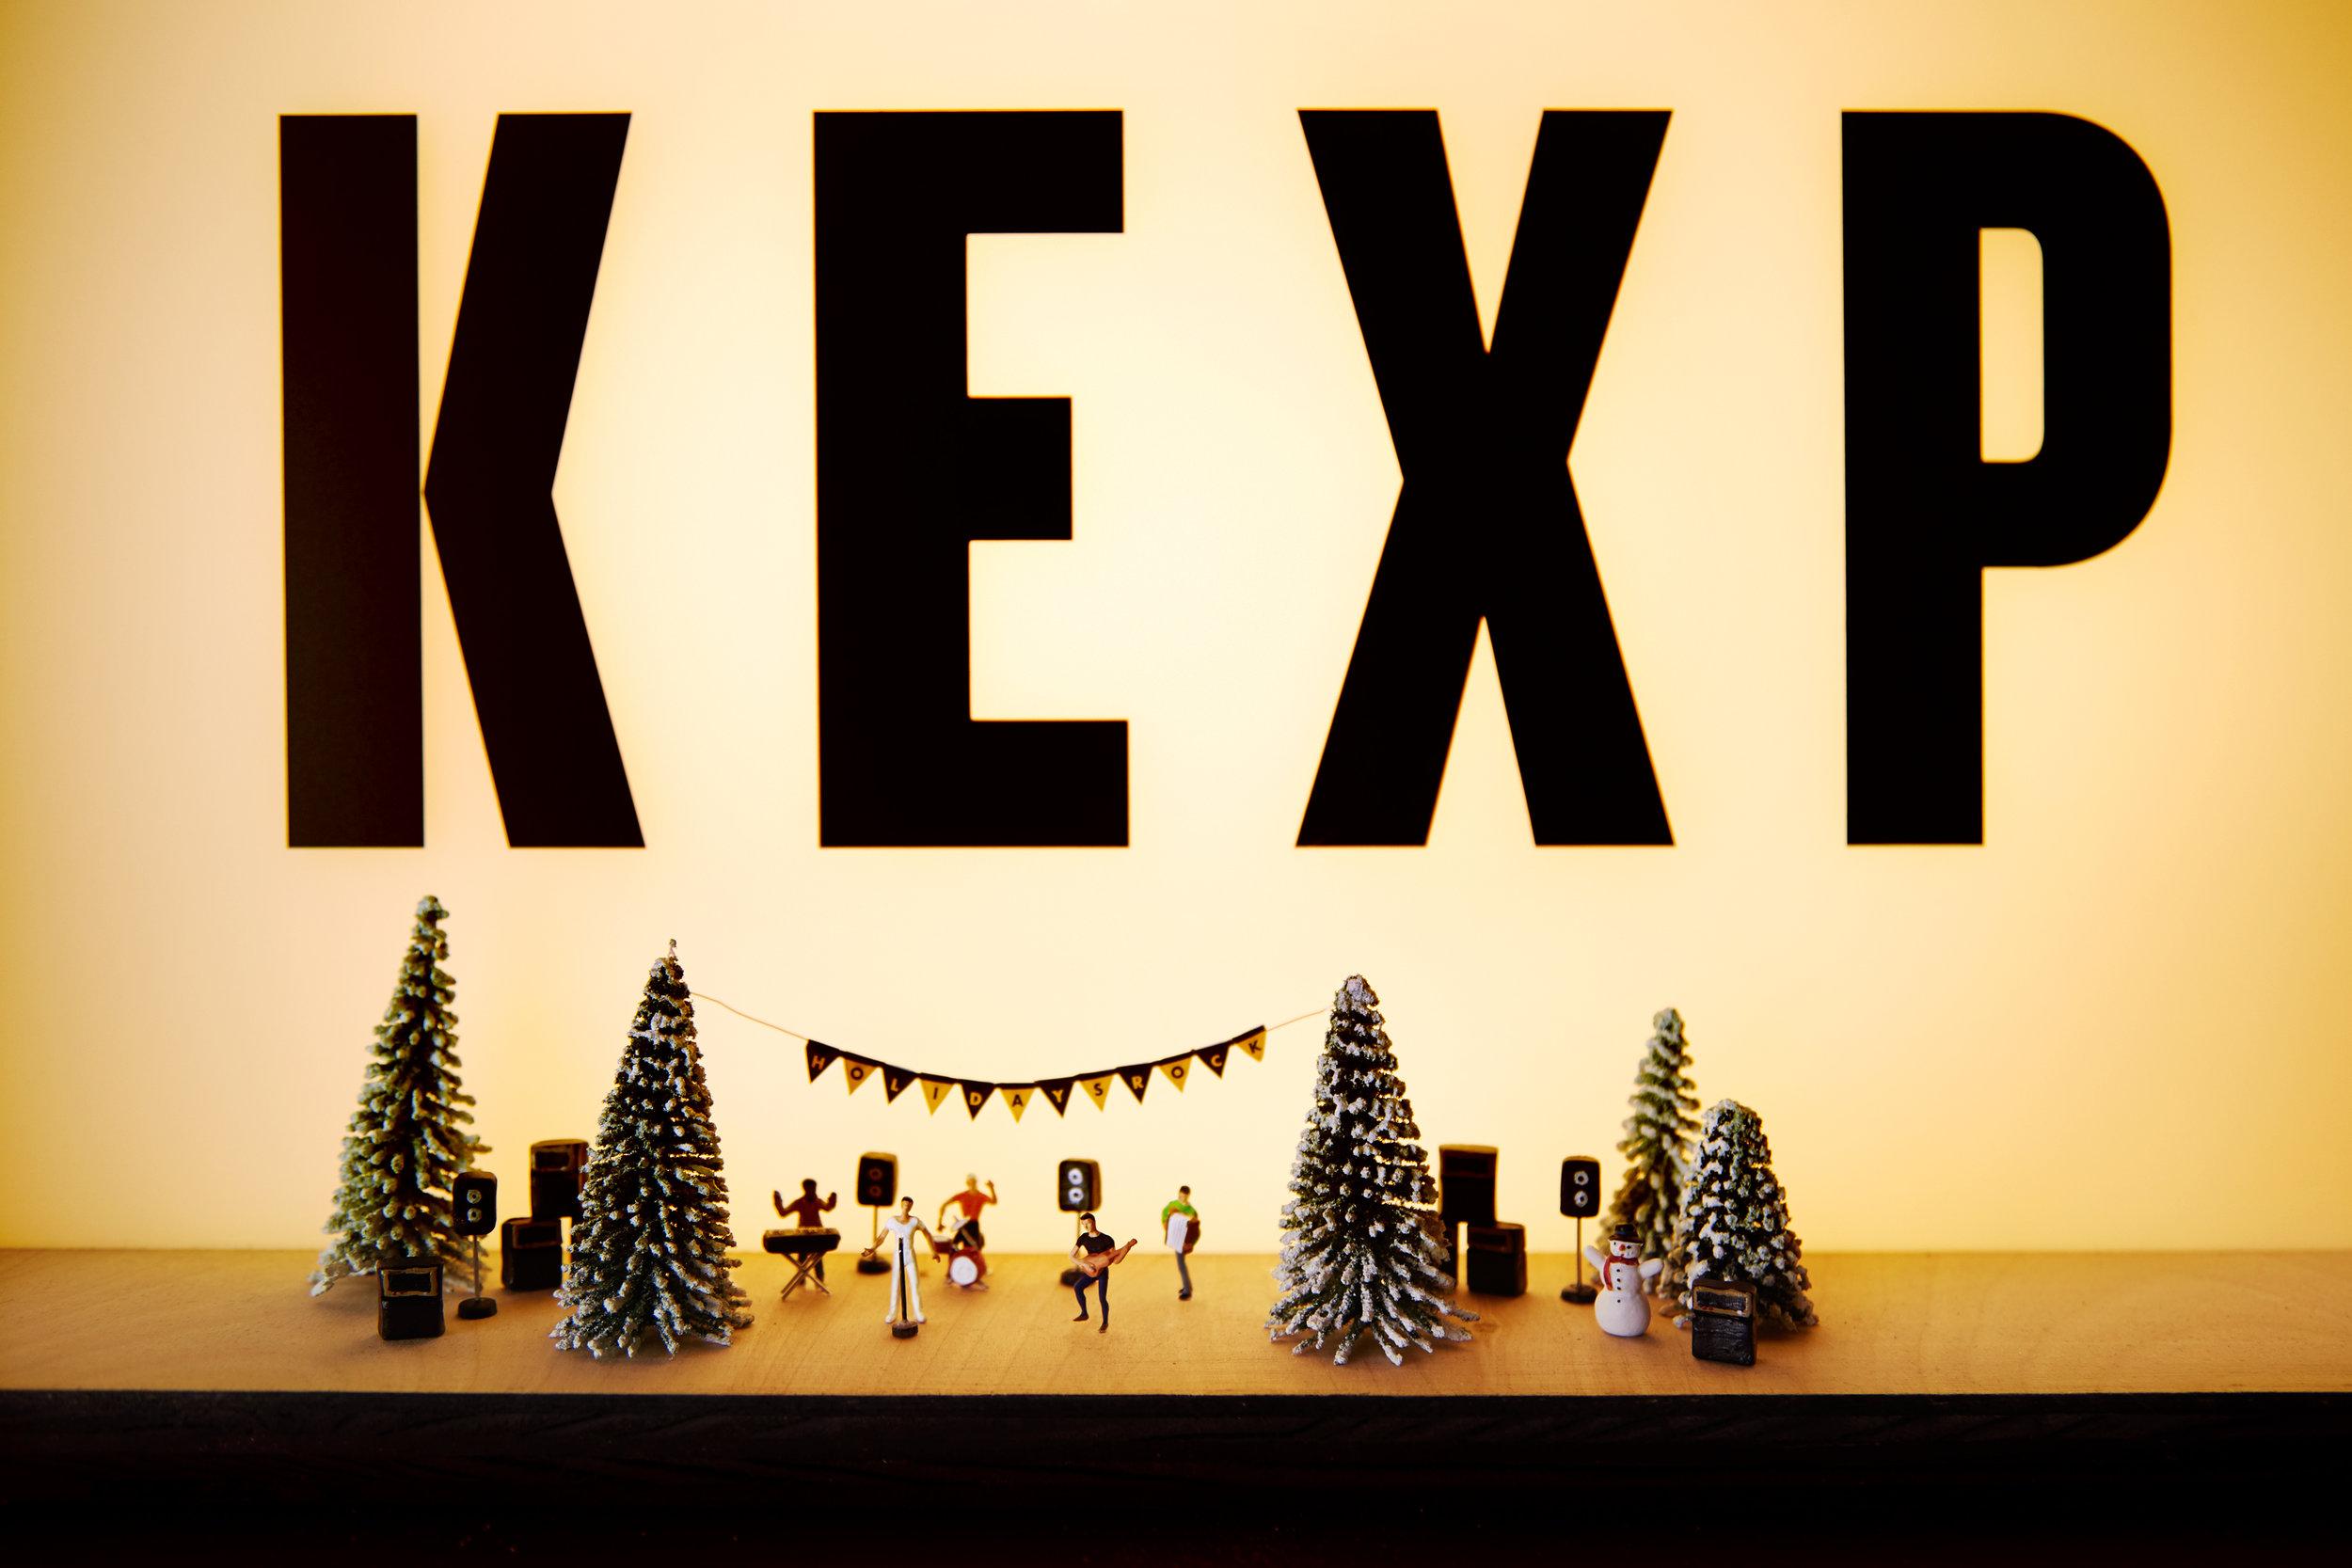 KEXP_05_0566.jpg